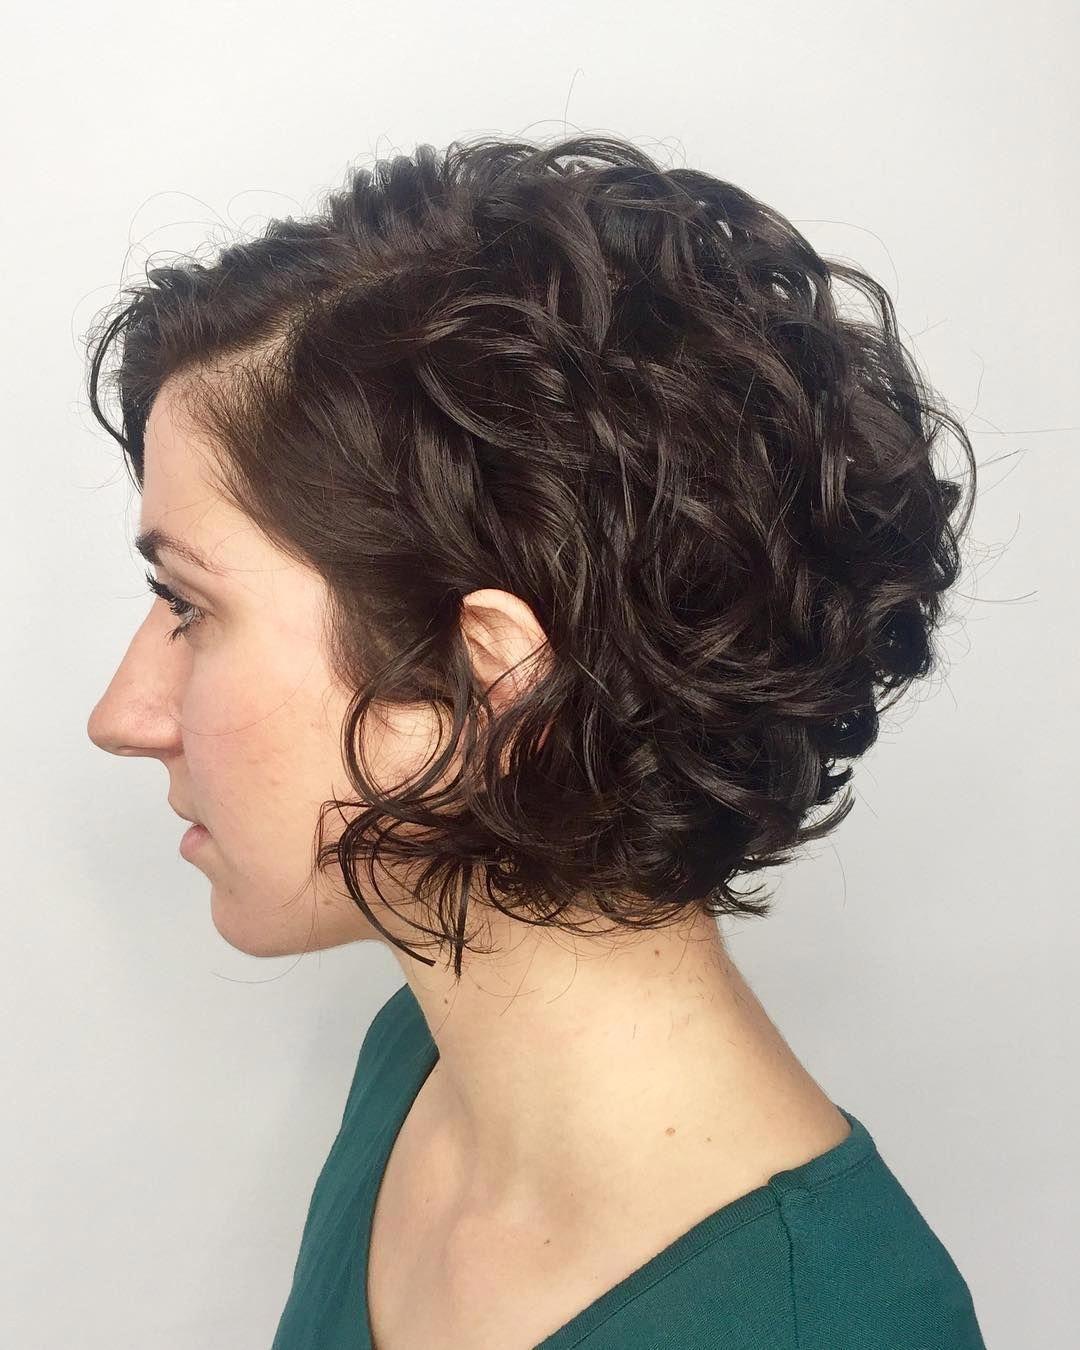 46+ Short curly bob inspirations